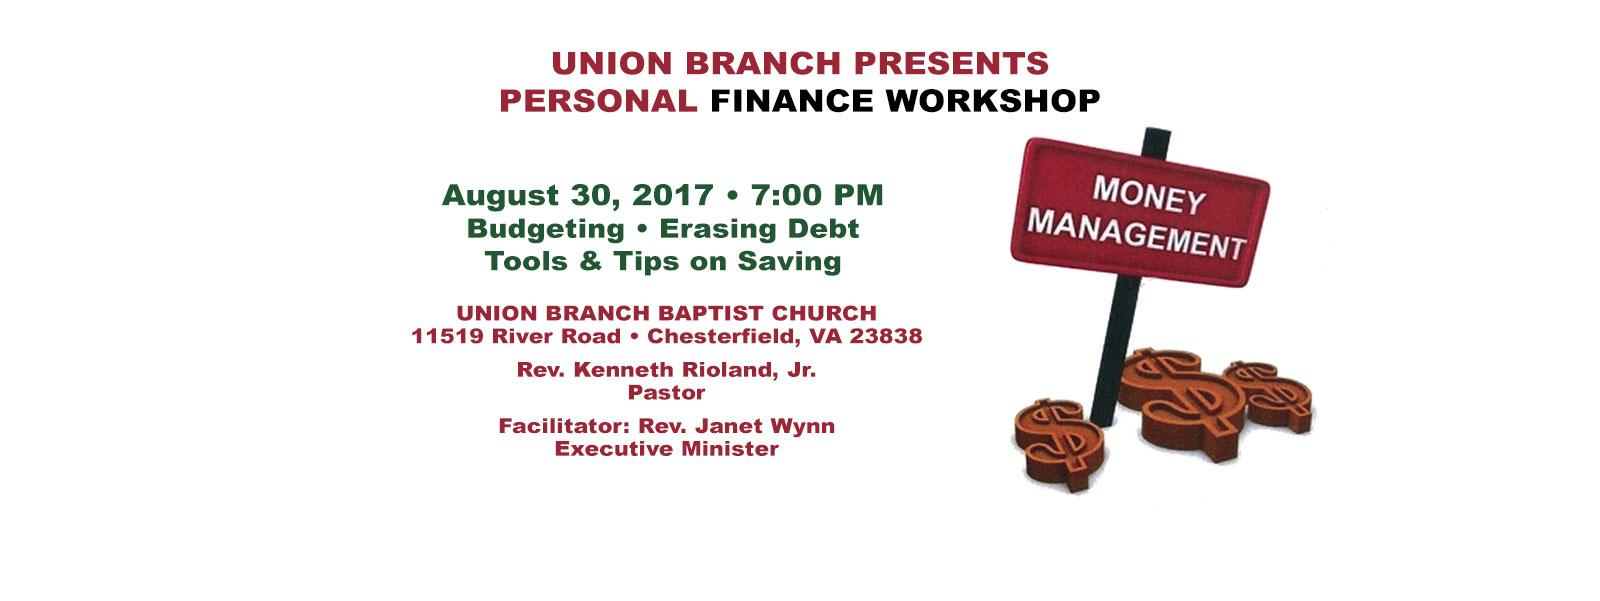 PersonalFinanceWorkshop